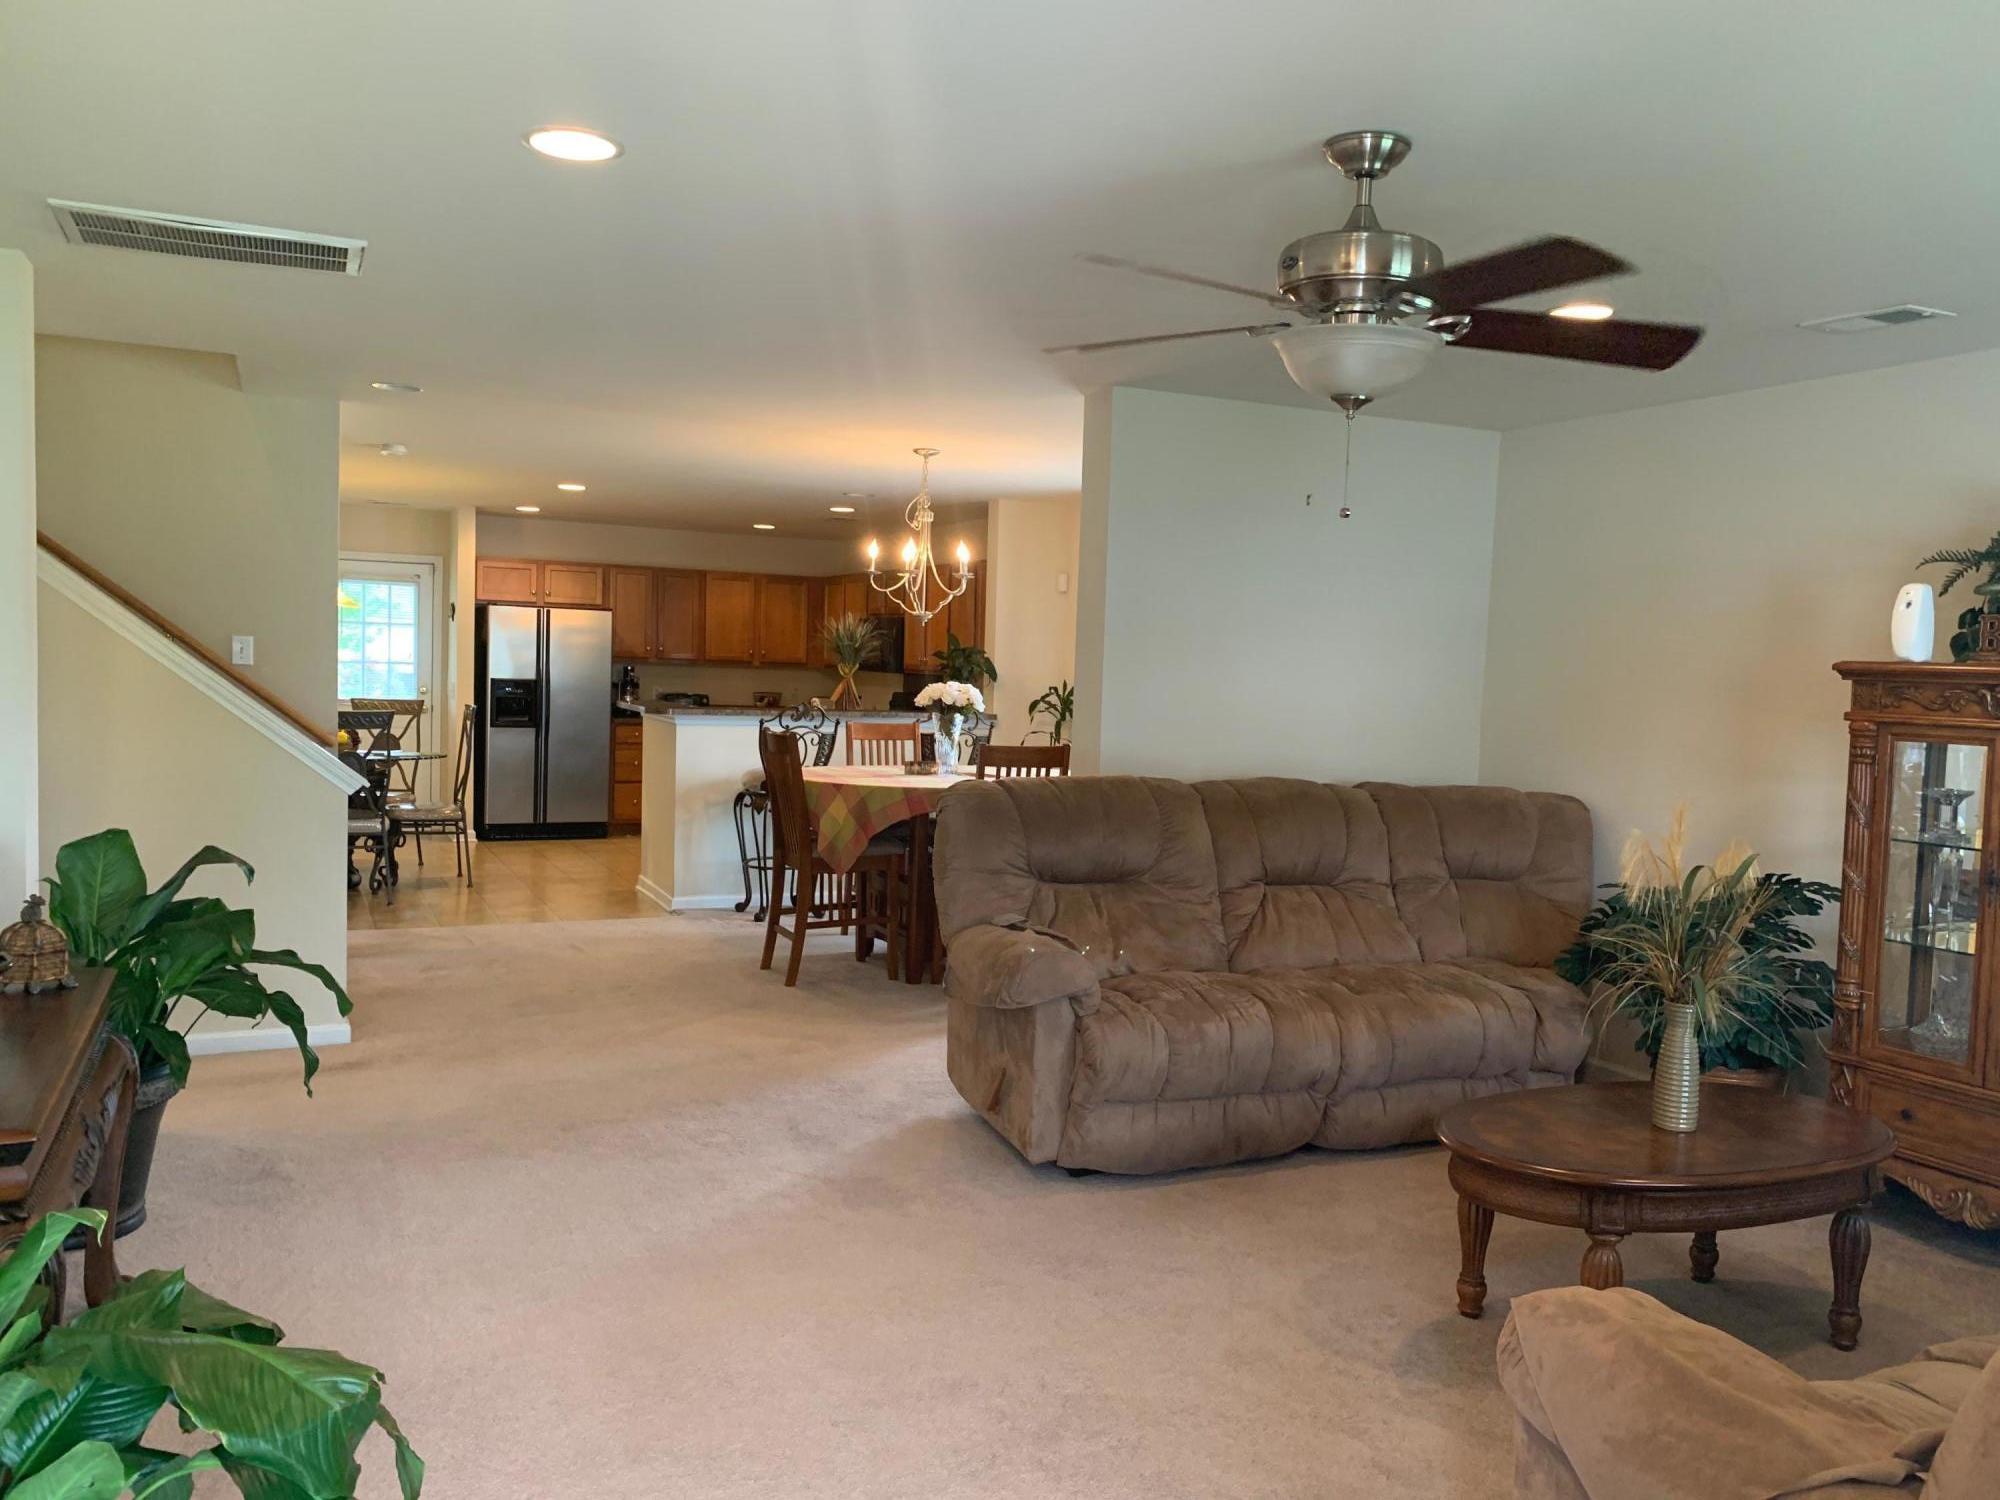 Hunters Bend Homes For Sale - 2036 Cripplecreek, Ladson, SC - 10